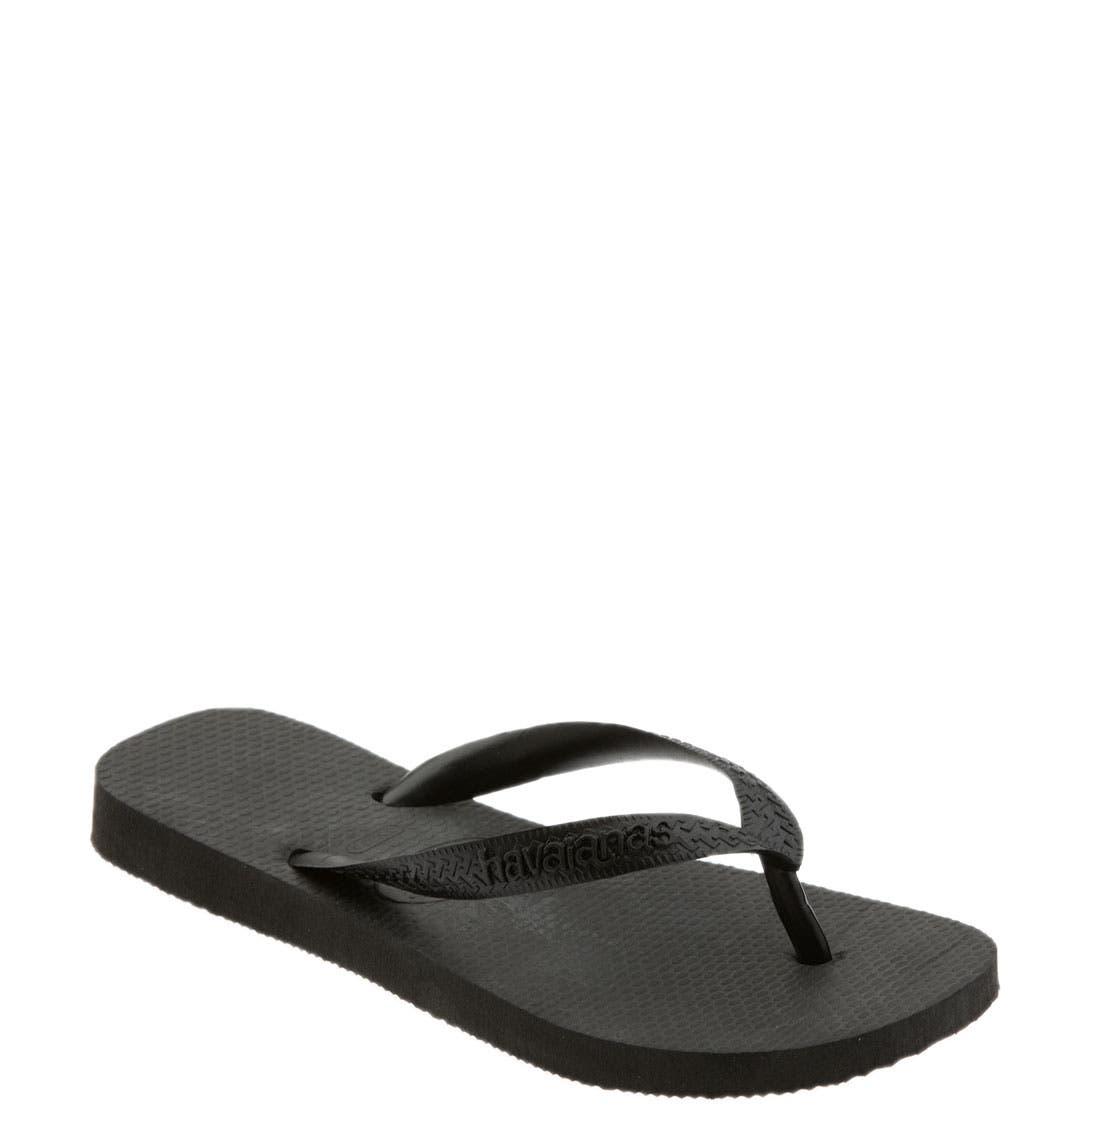 Main Image - Havaianas 'Top' Sandal (Women)